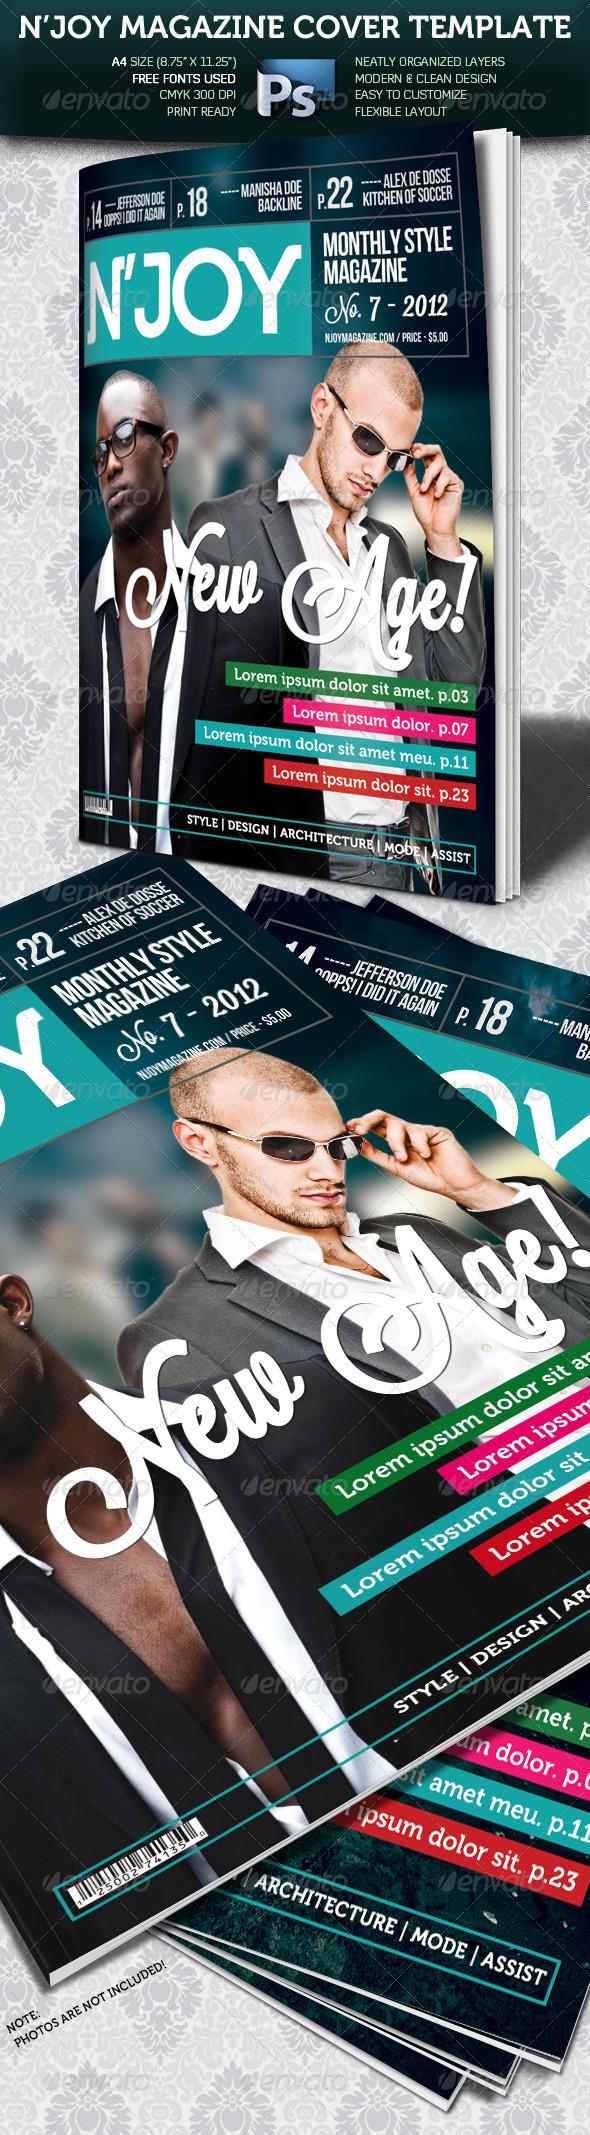 N'joy A4 Magazine Cover - Magazines Print Templates